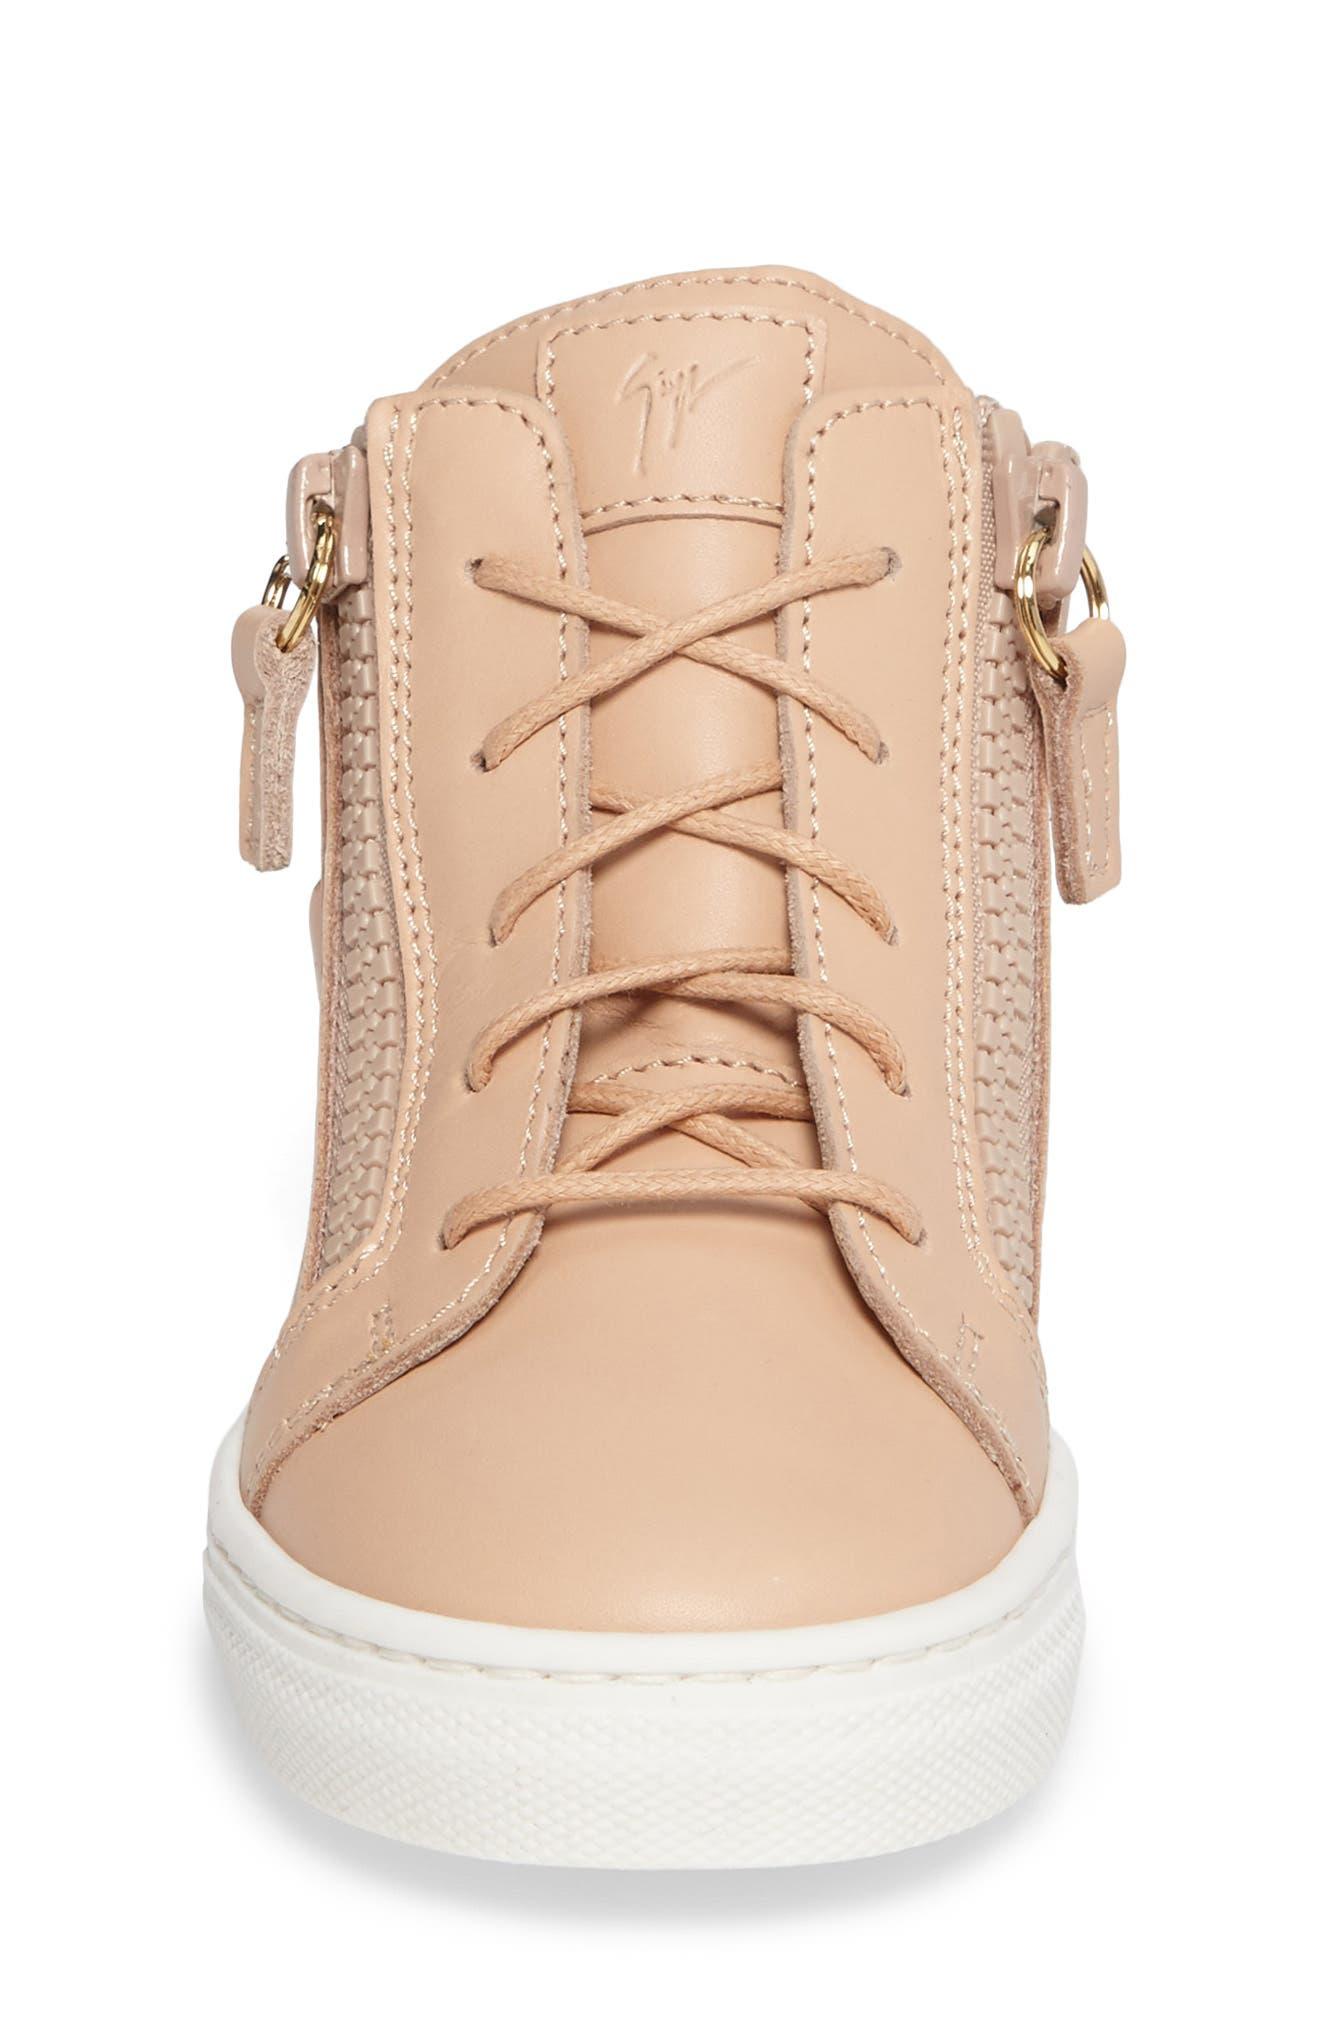 Foglia Embellished Zip Sneaker,                             Alternate thumbnail 4, color,                             Shell Leather